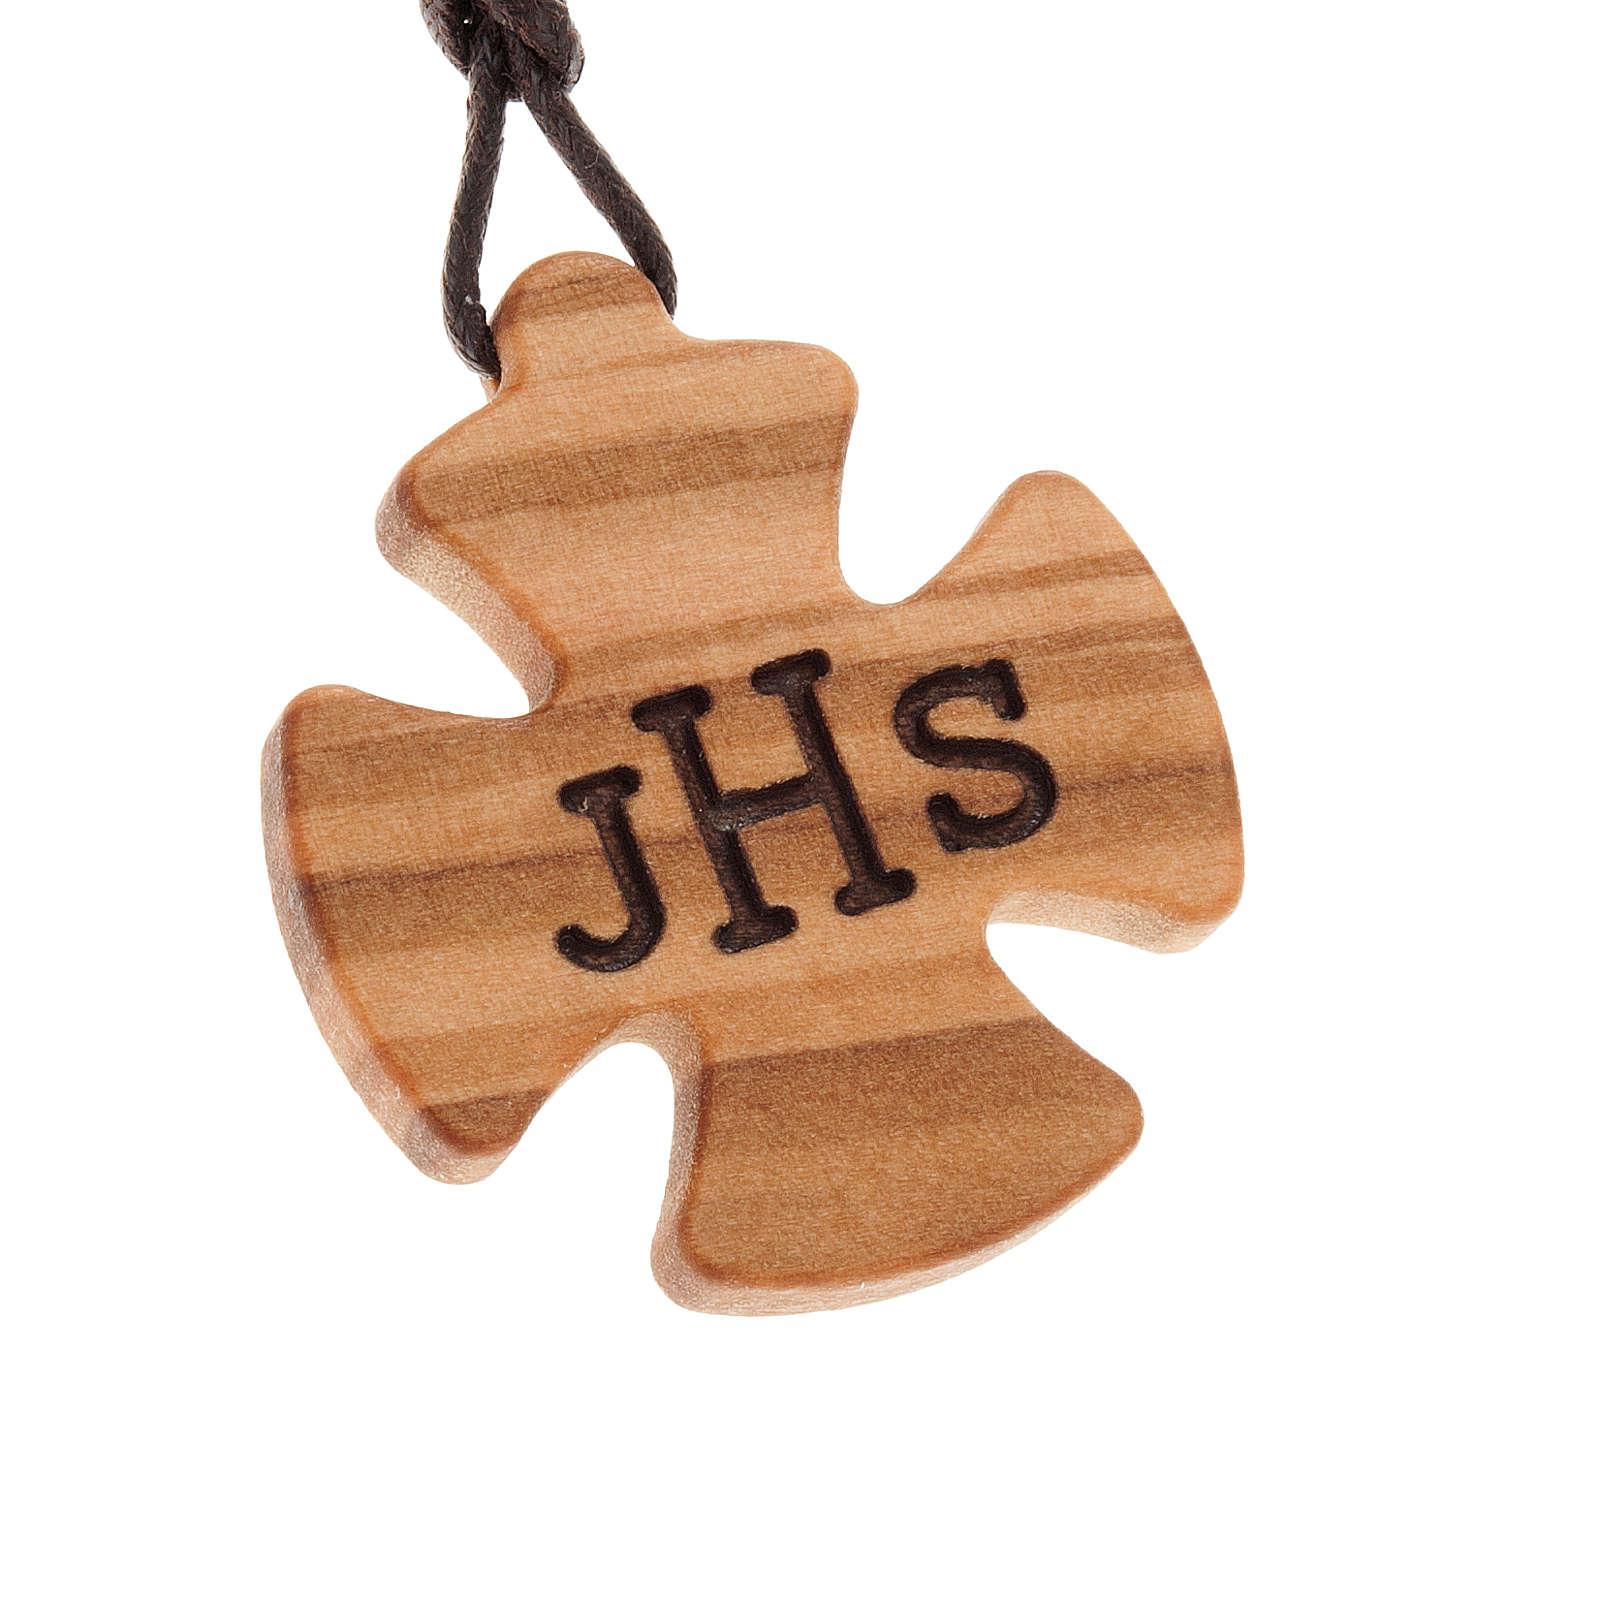 Croce olivo inciso JHS 4